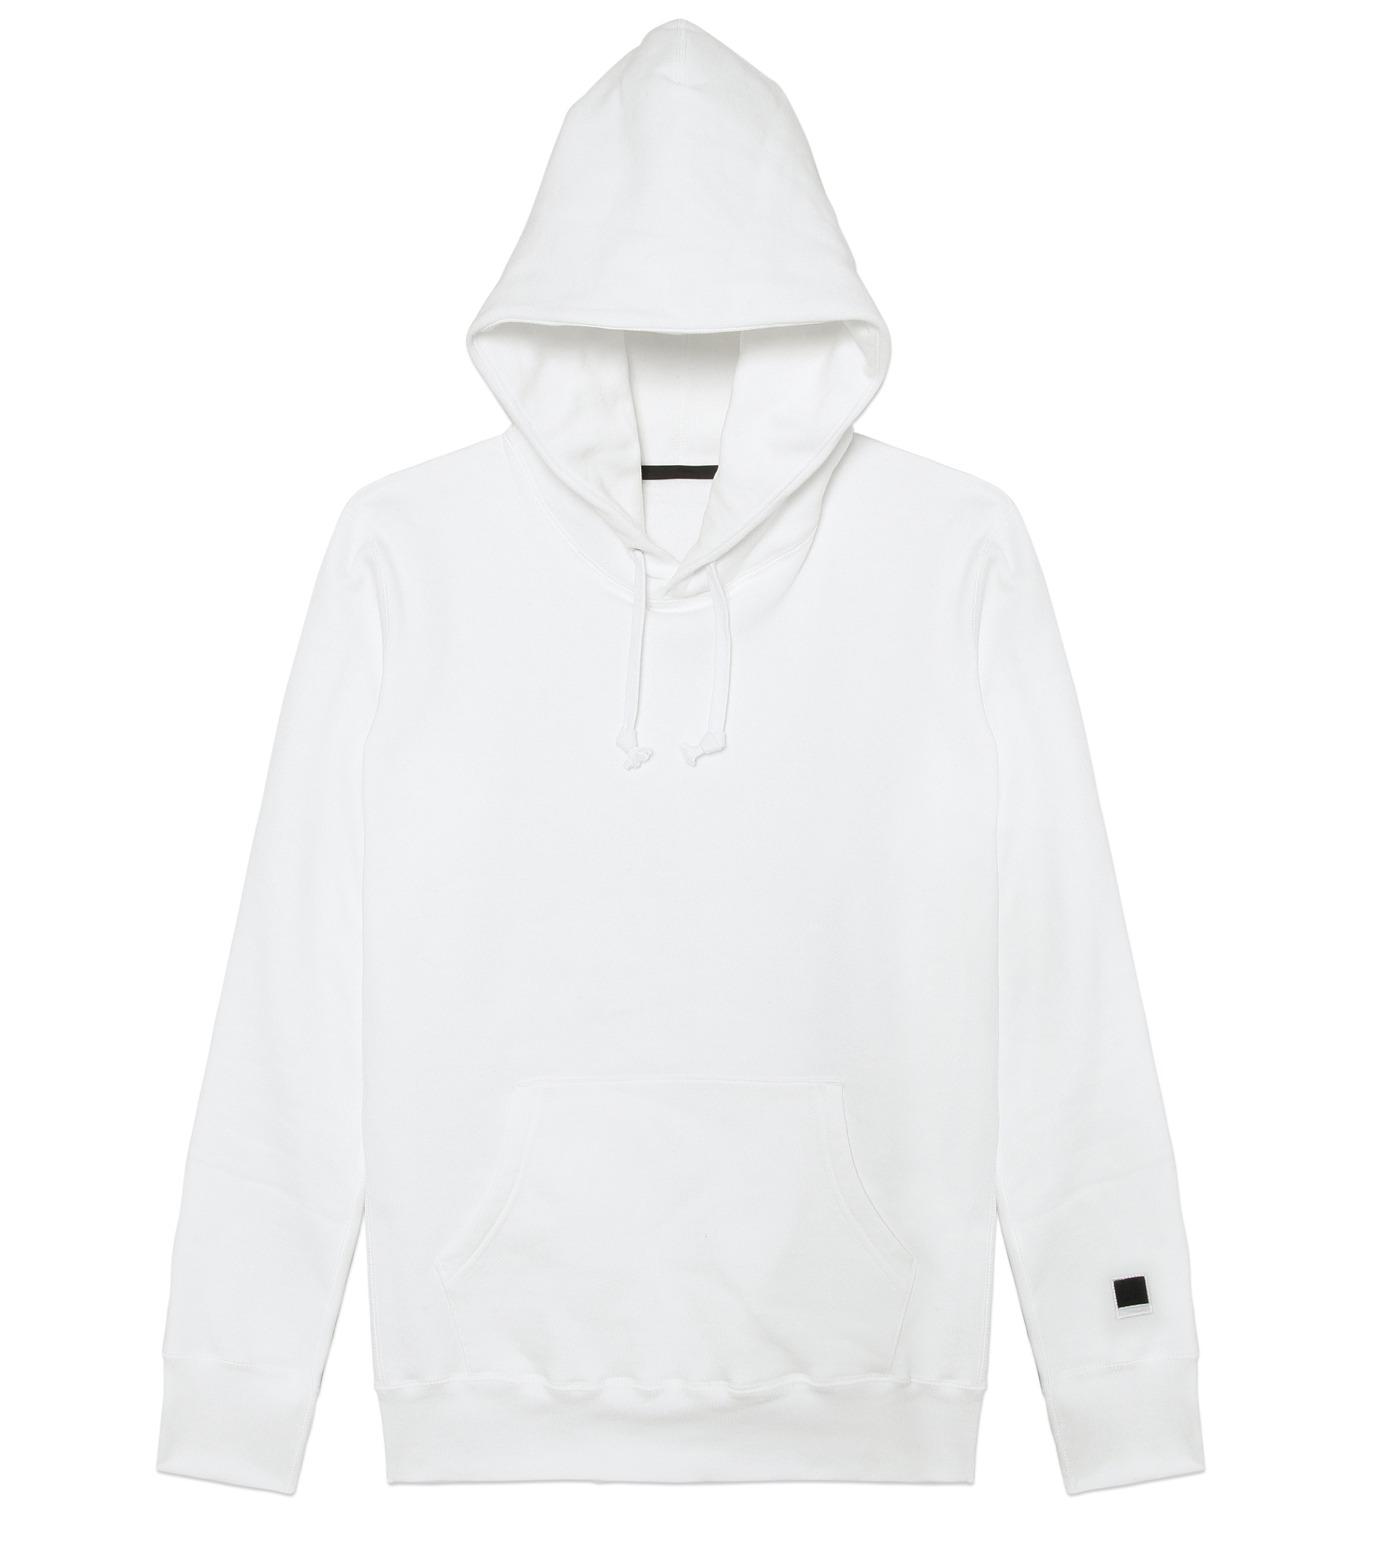 HL HEDDIE LOVU(エイチエル・エディールーヴ)のHL Hooded P/O-WHITE(カットソー/cut and sewn)-16A92008-4 拡大詳細画像6